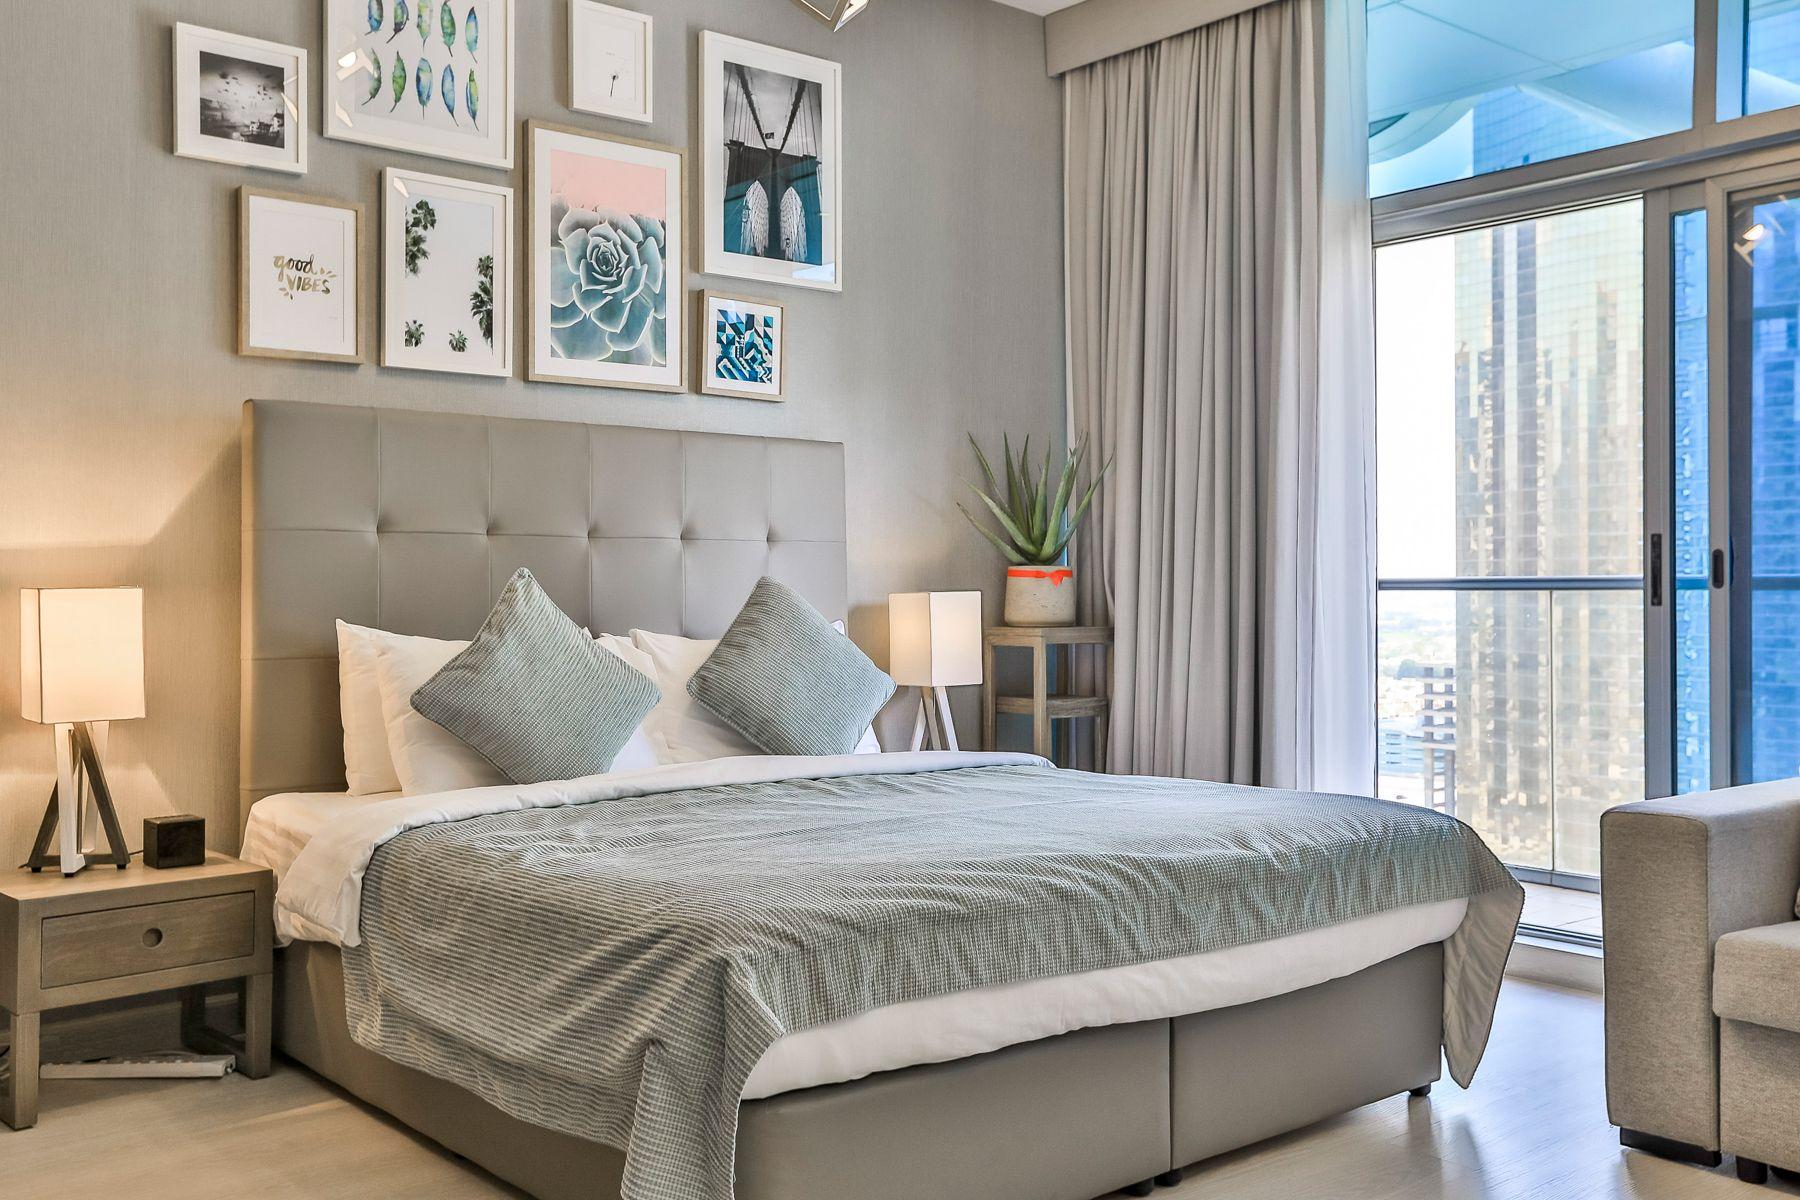 Studio for Rent in Indigo Tower, Jumeirah Lake Towers